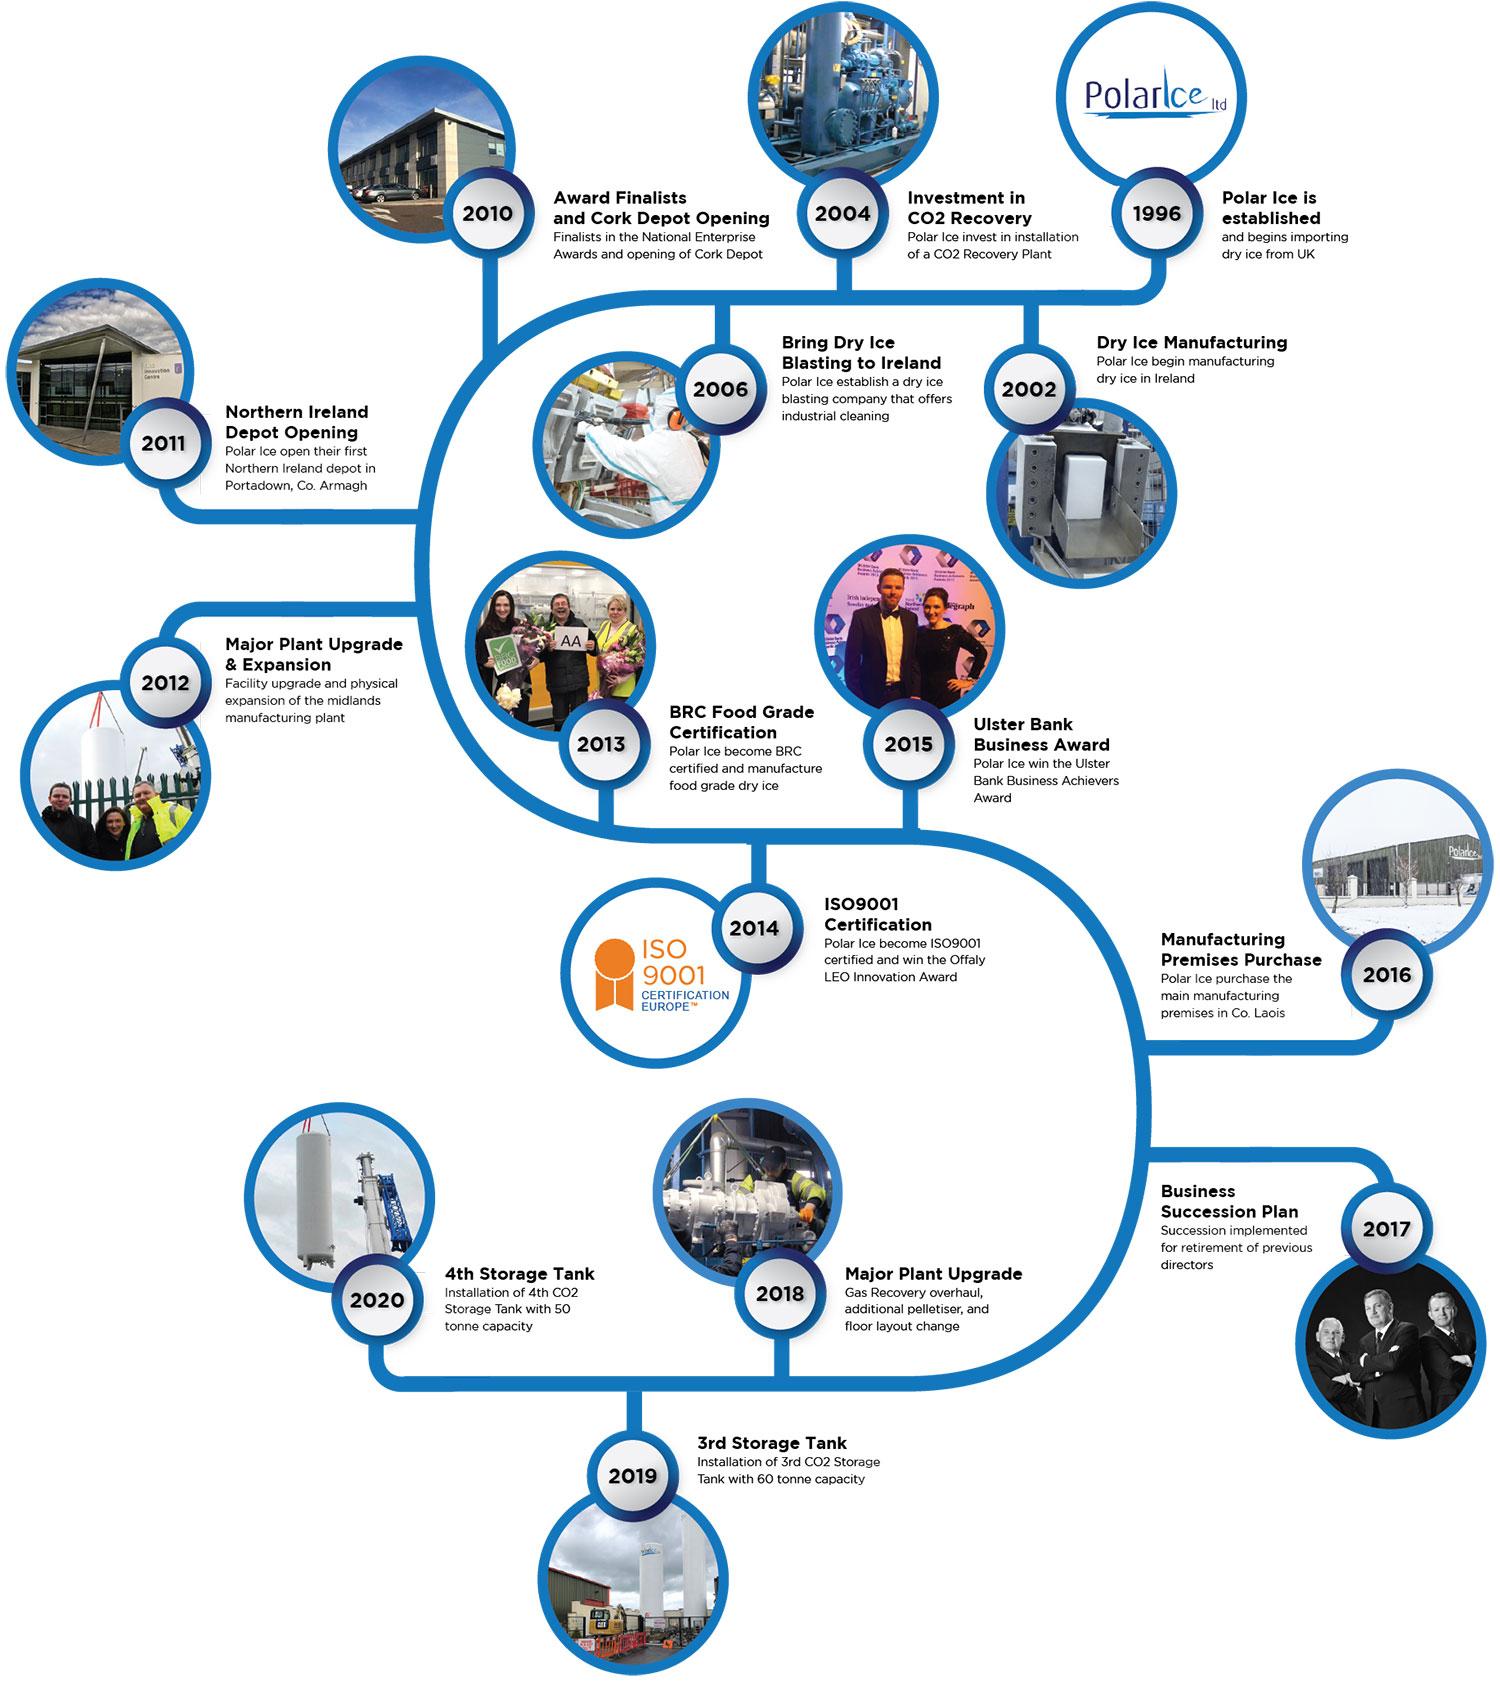 Timeline of Polar Ice's Business Development Milestones